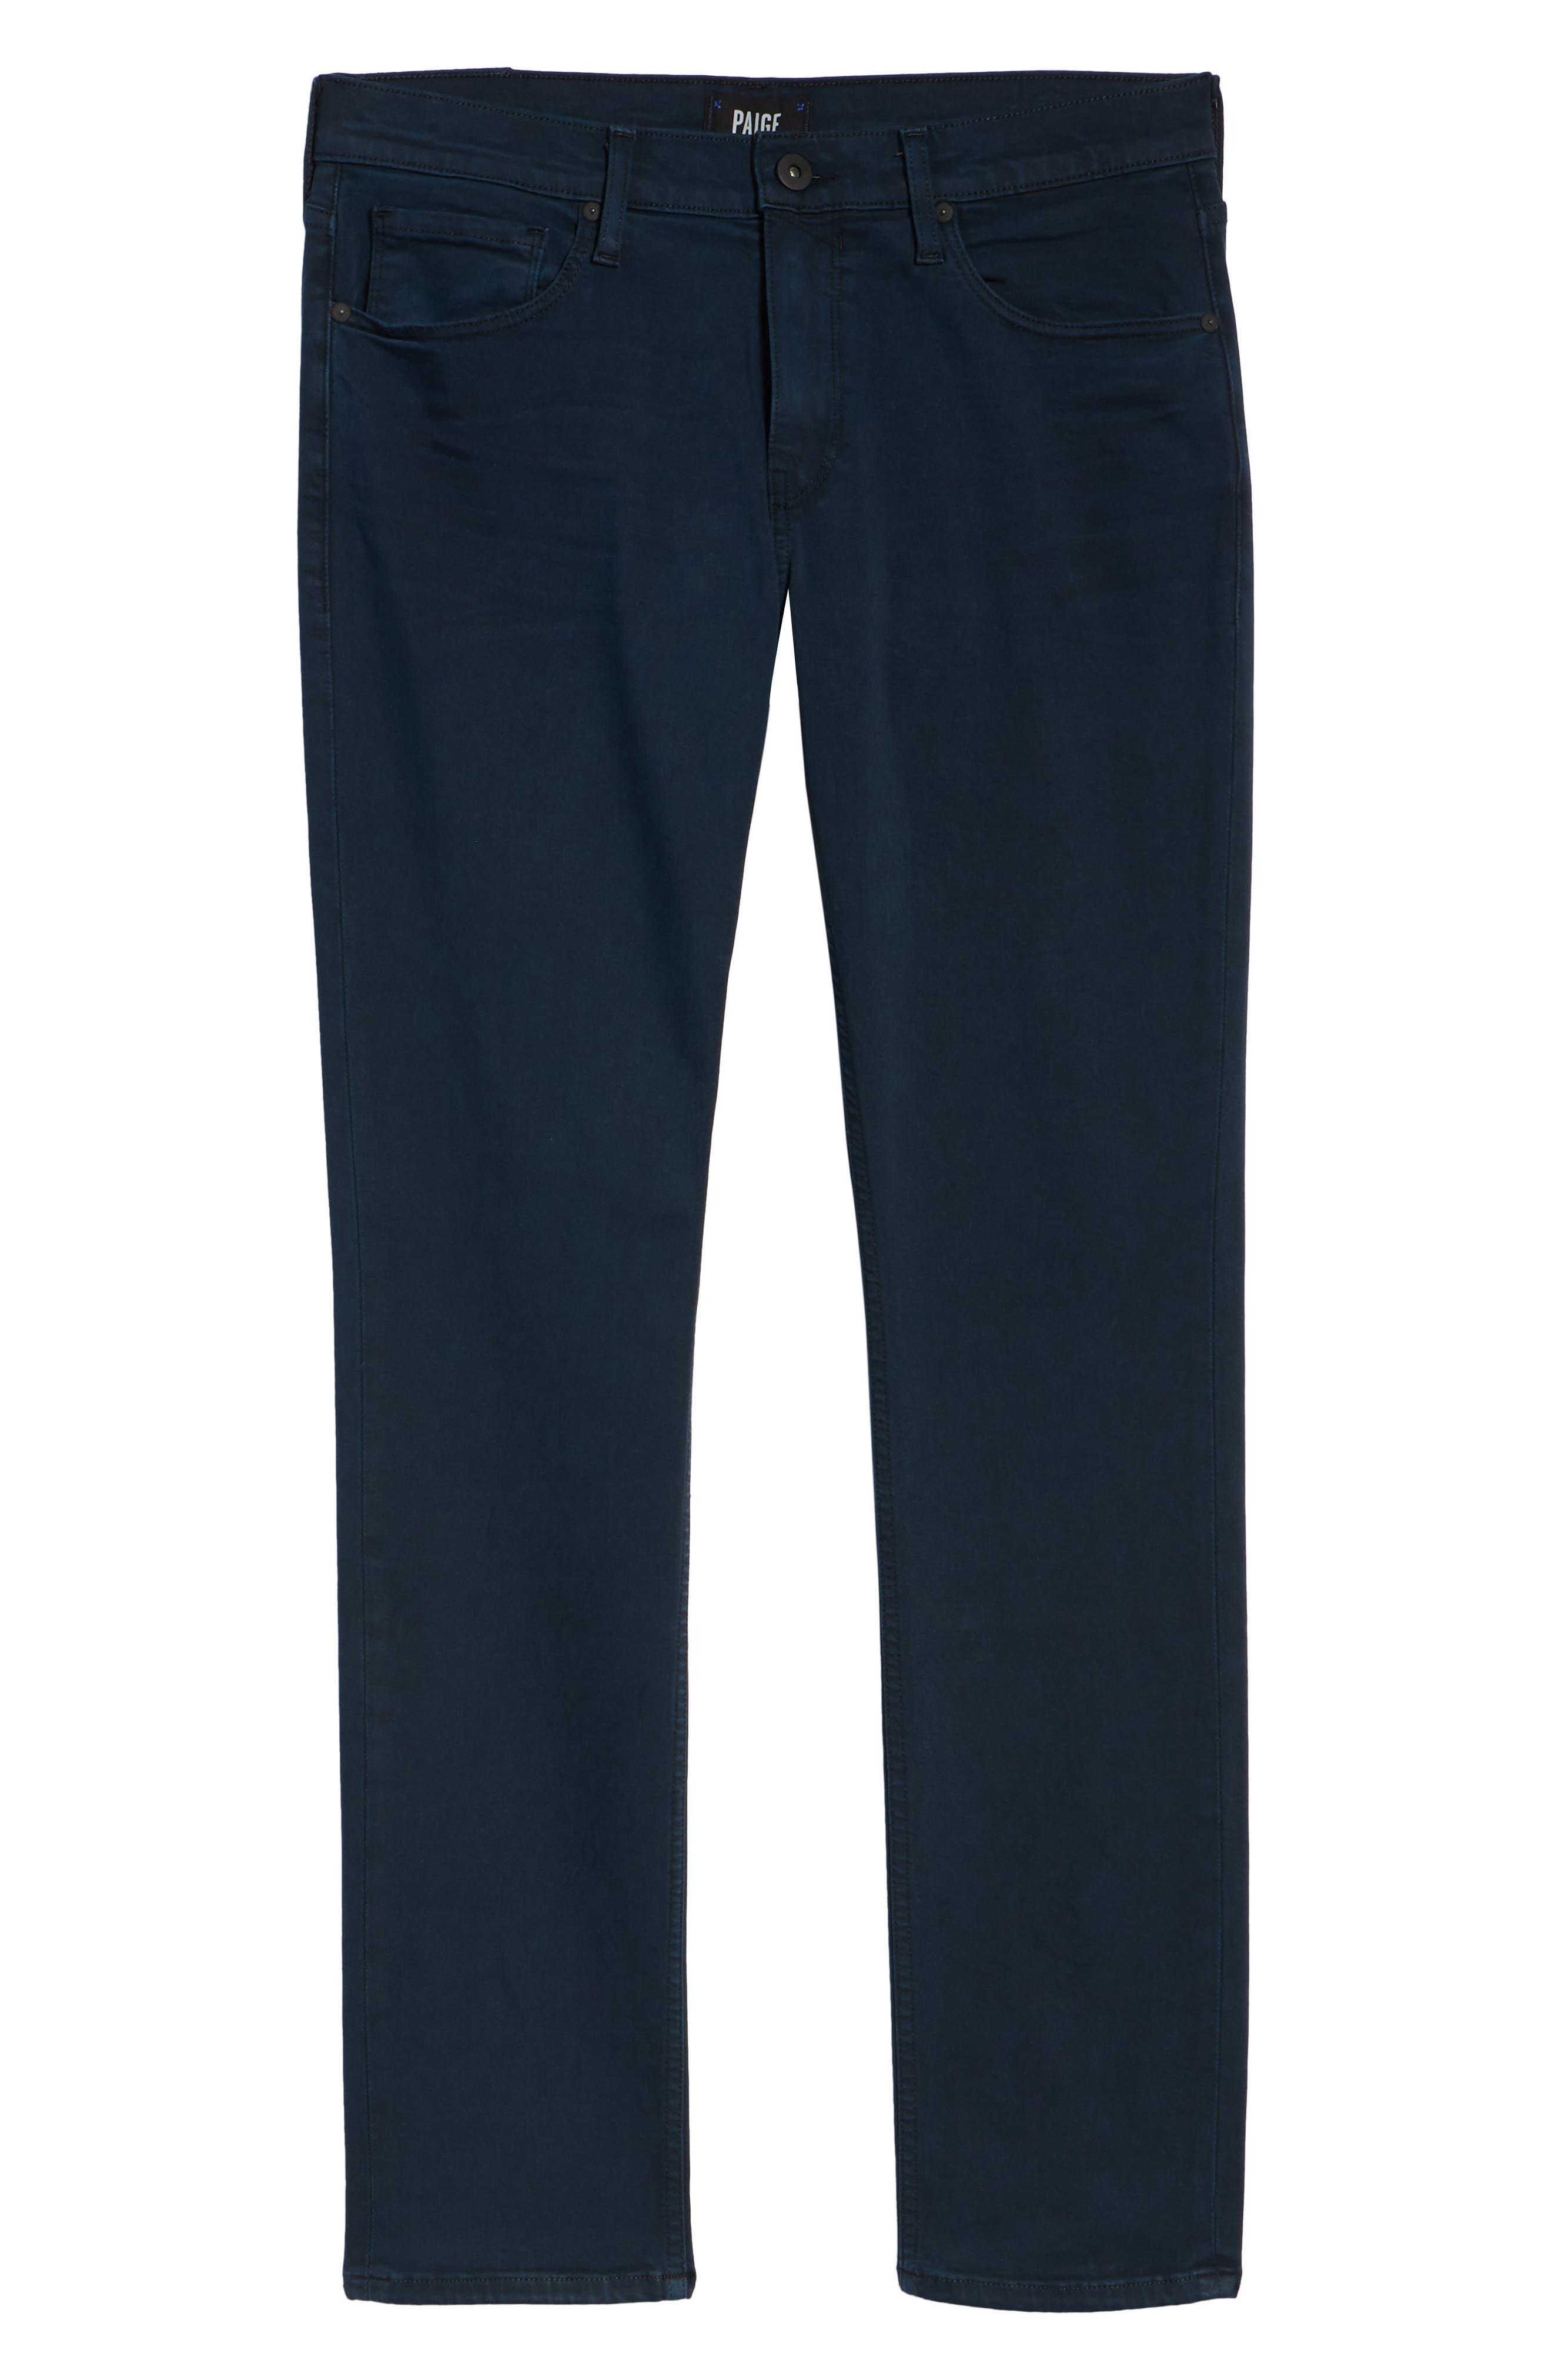 Transcend - Federal Slim Straight Leg Jeans,                             Alternate thumbnail 6, color,                             VINTAGE SKYFALL